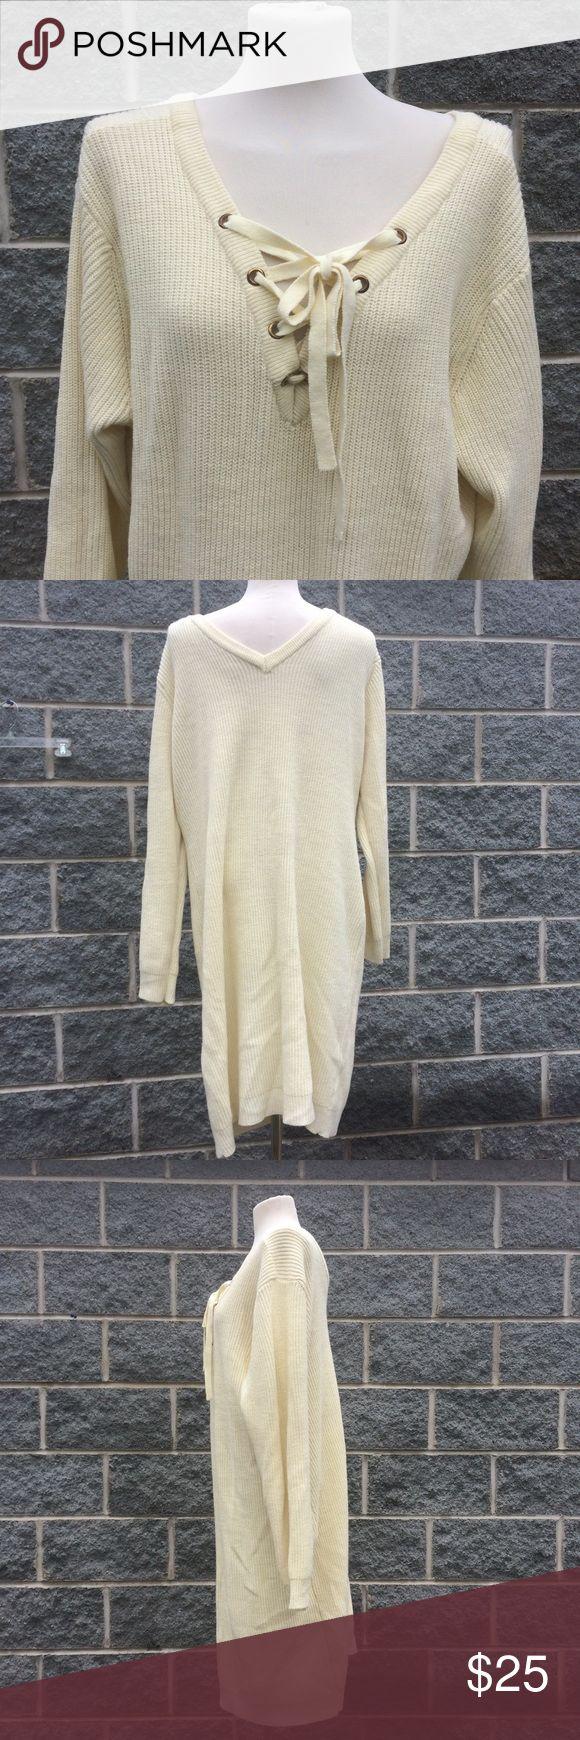 "Ashley Stewart Cream Lace Neck Sweater Dress 26 Ashley Stewart  Cream Sweater Dress  Long Sleeve  Lace Neck  Womens 26  Measurements when laid flat:  Shoulders: 18.5"" Chest: 21.5"" Waist: 23"" Length: 37"" Sleeve (shoulder to cuff): 23.5"" Ashley Stewart Dresses Midi"